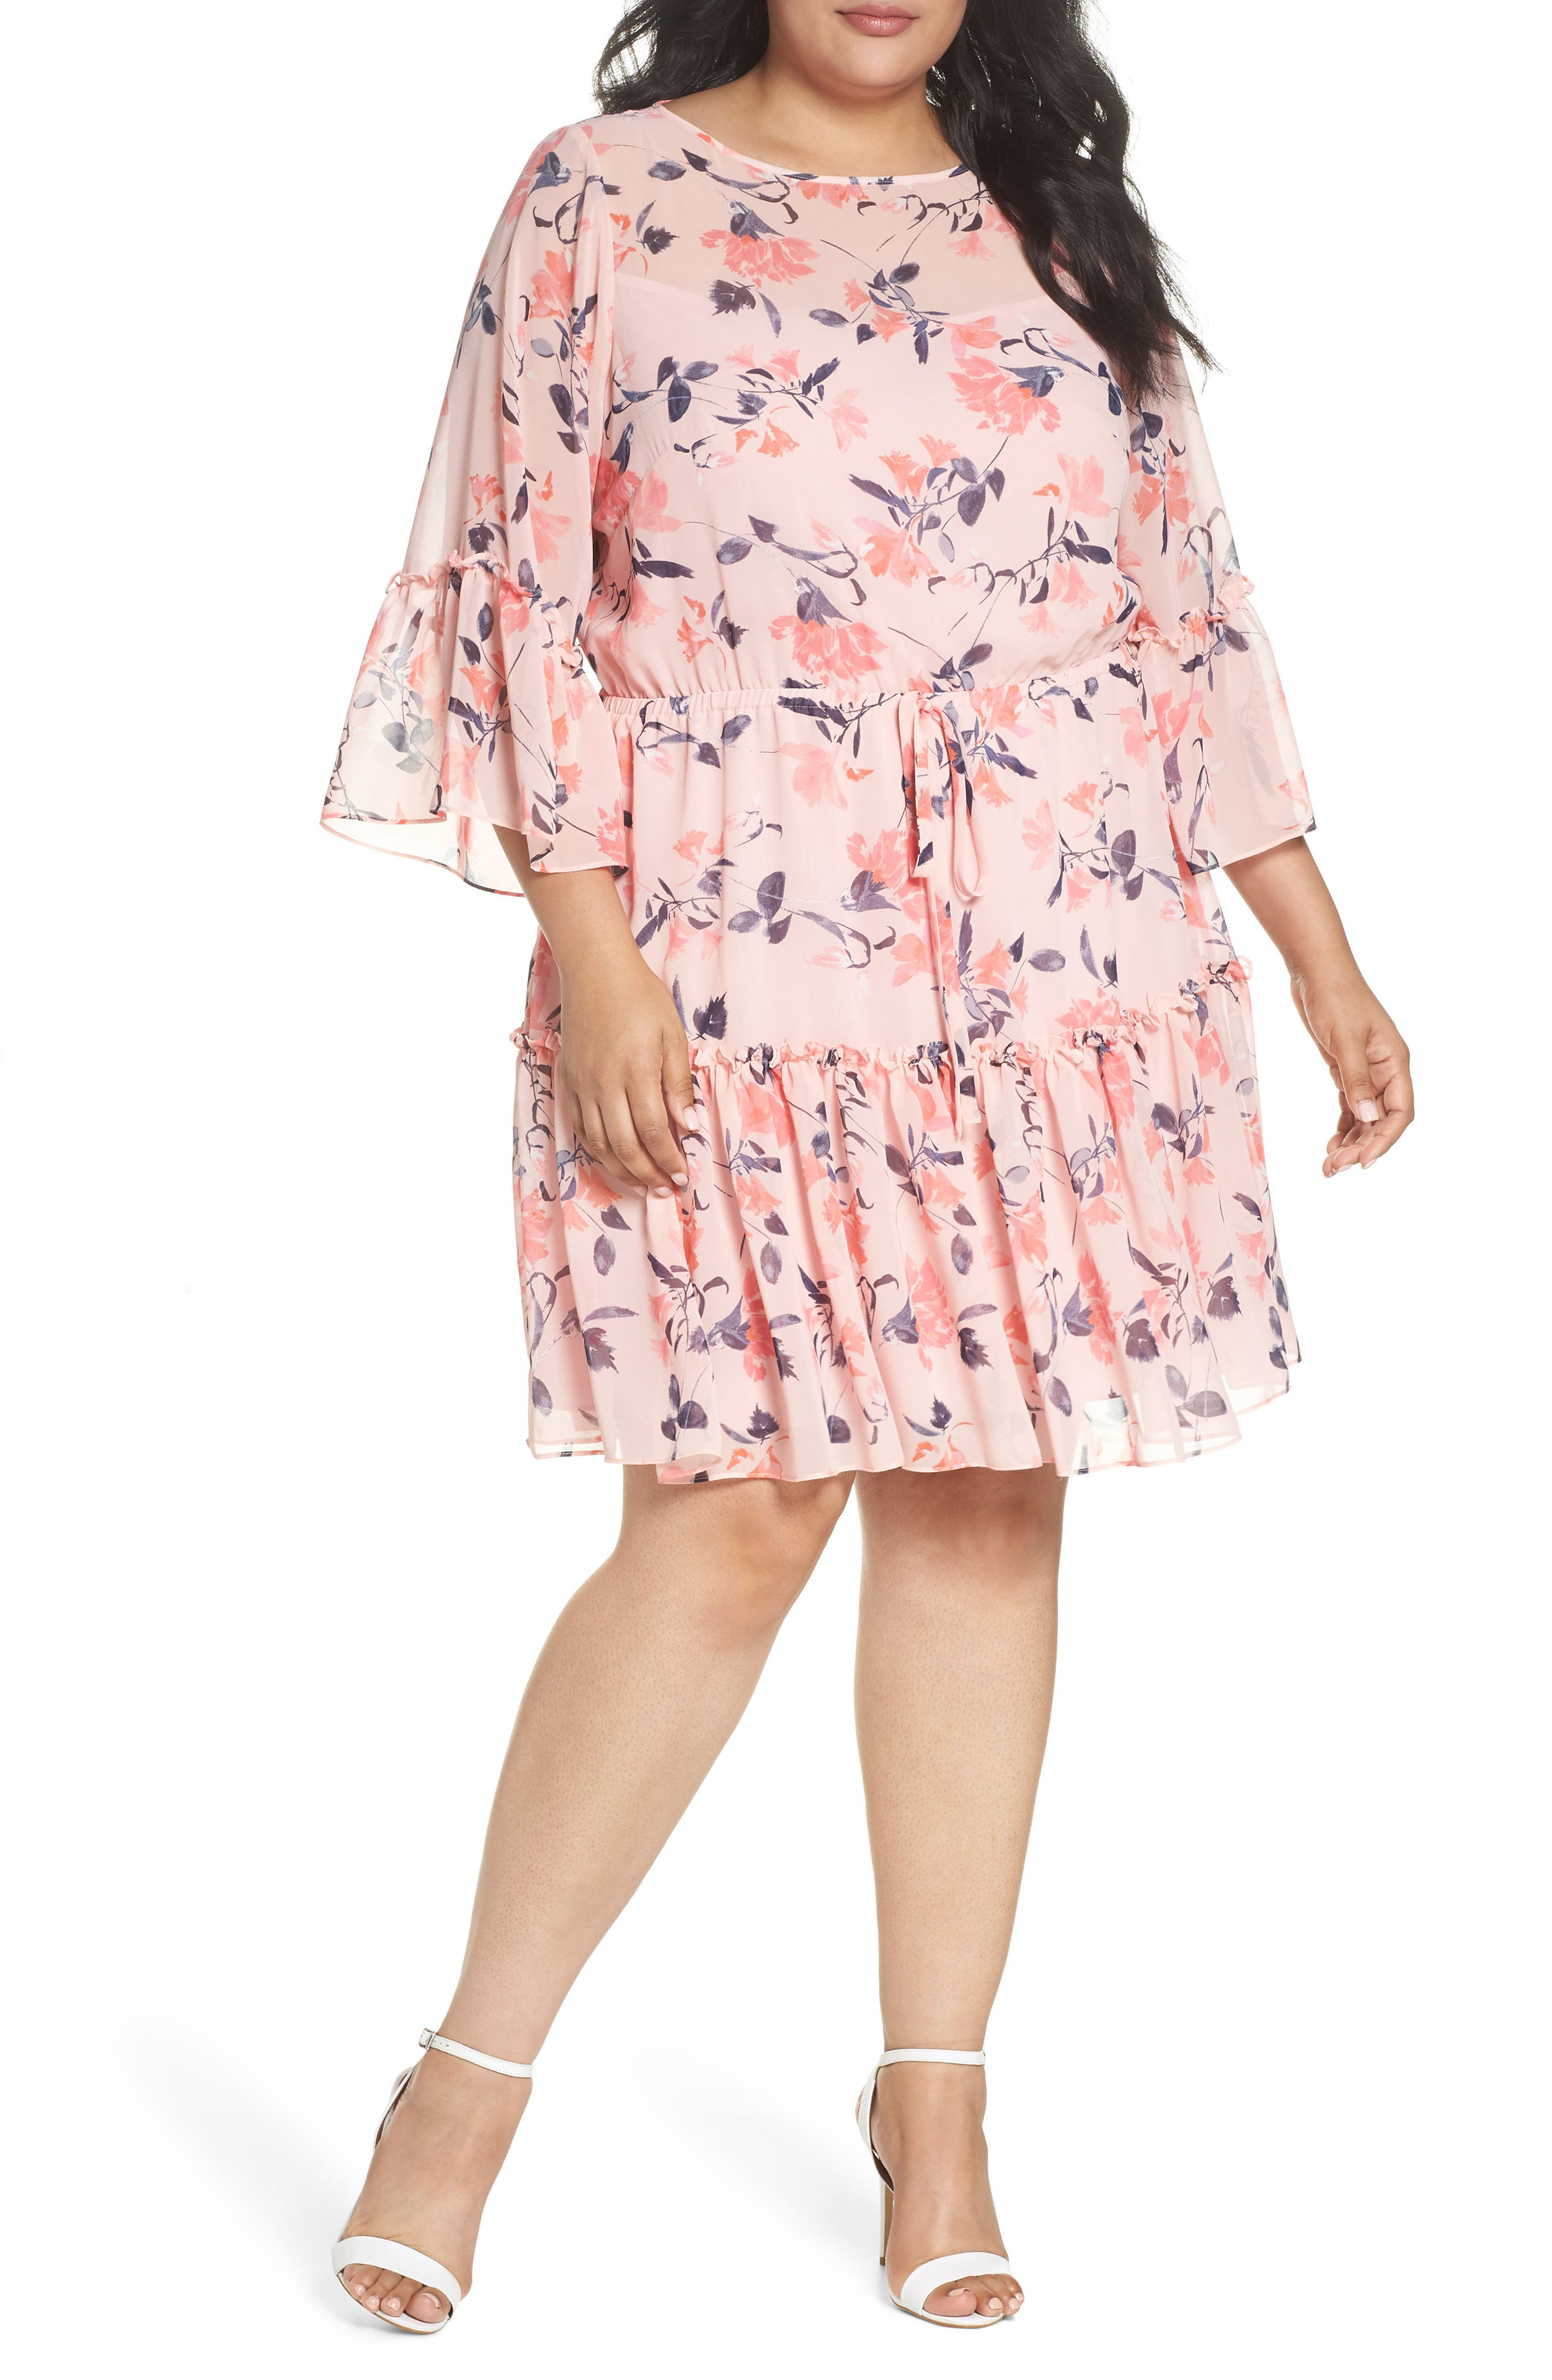 Elza J Floral Bell Sleeve Chiffon Dress,                             Main thumbnail 1, color,                             Blush